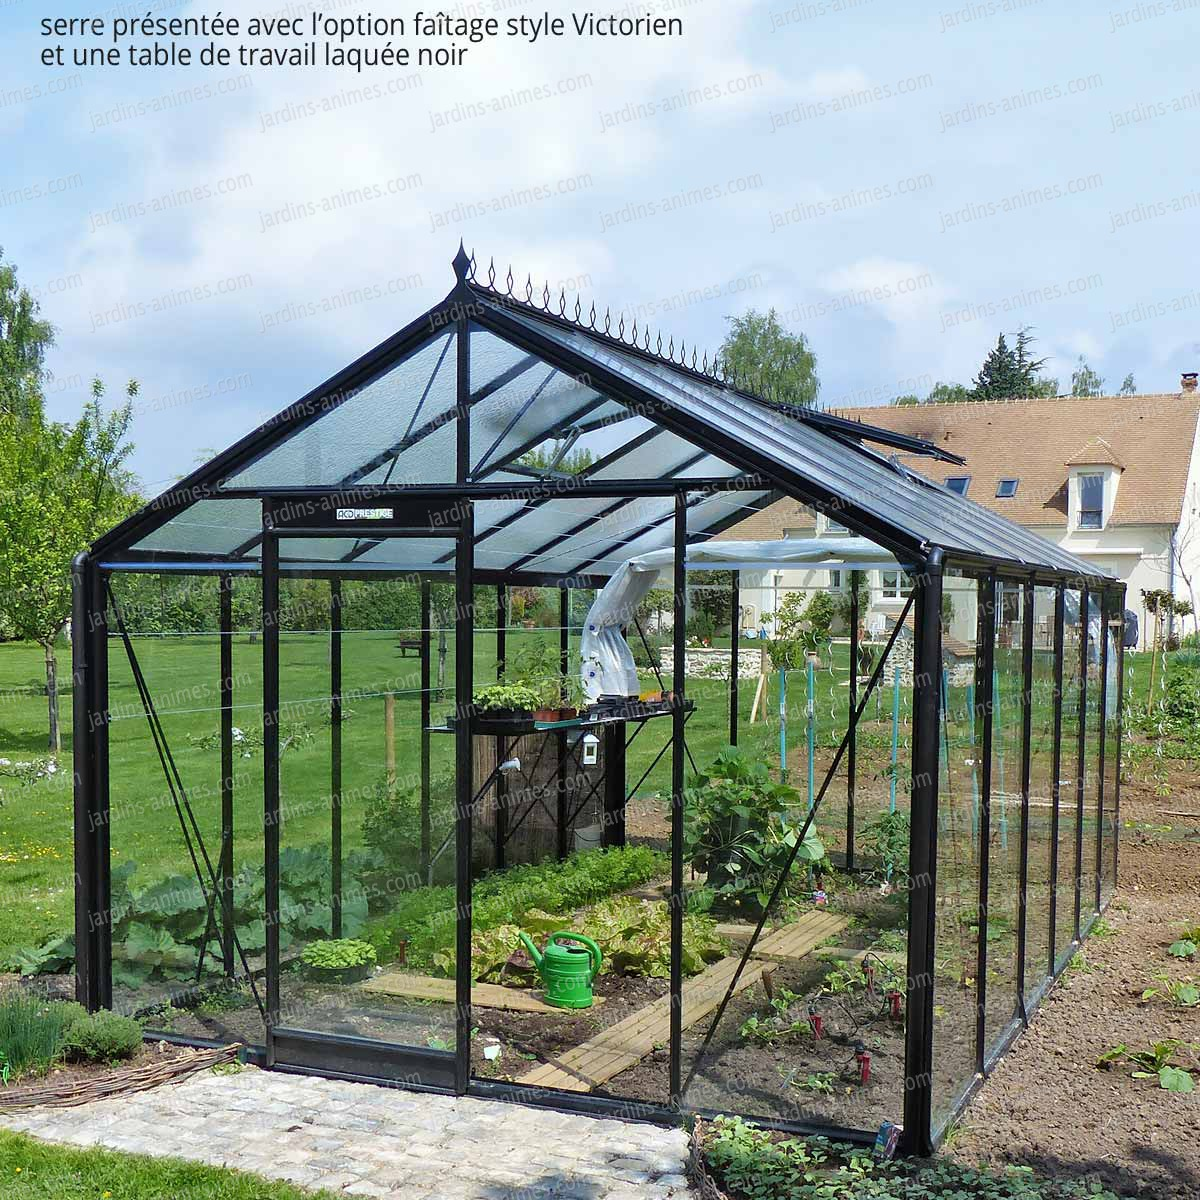 Serre prestige noir r306h serre jardin for Jardin 0 l4anglaise